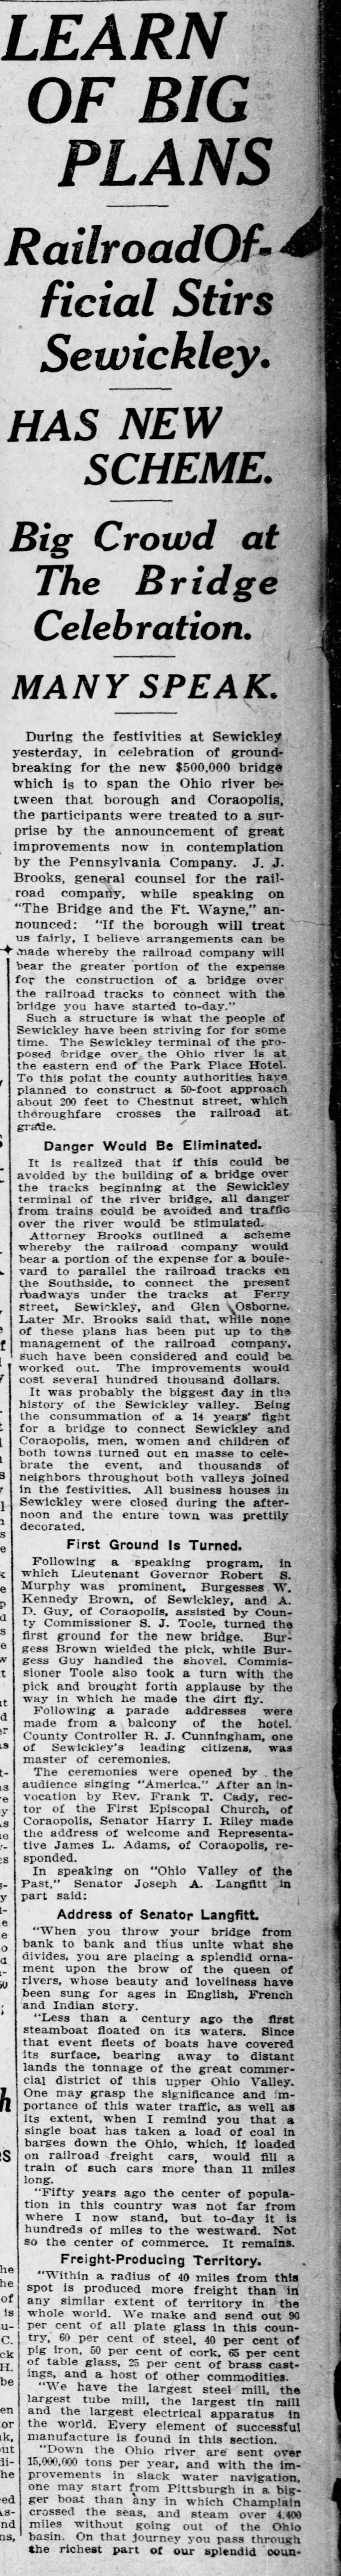 1909-07-22 The Pittsburgh Post (p1).jpg